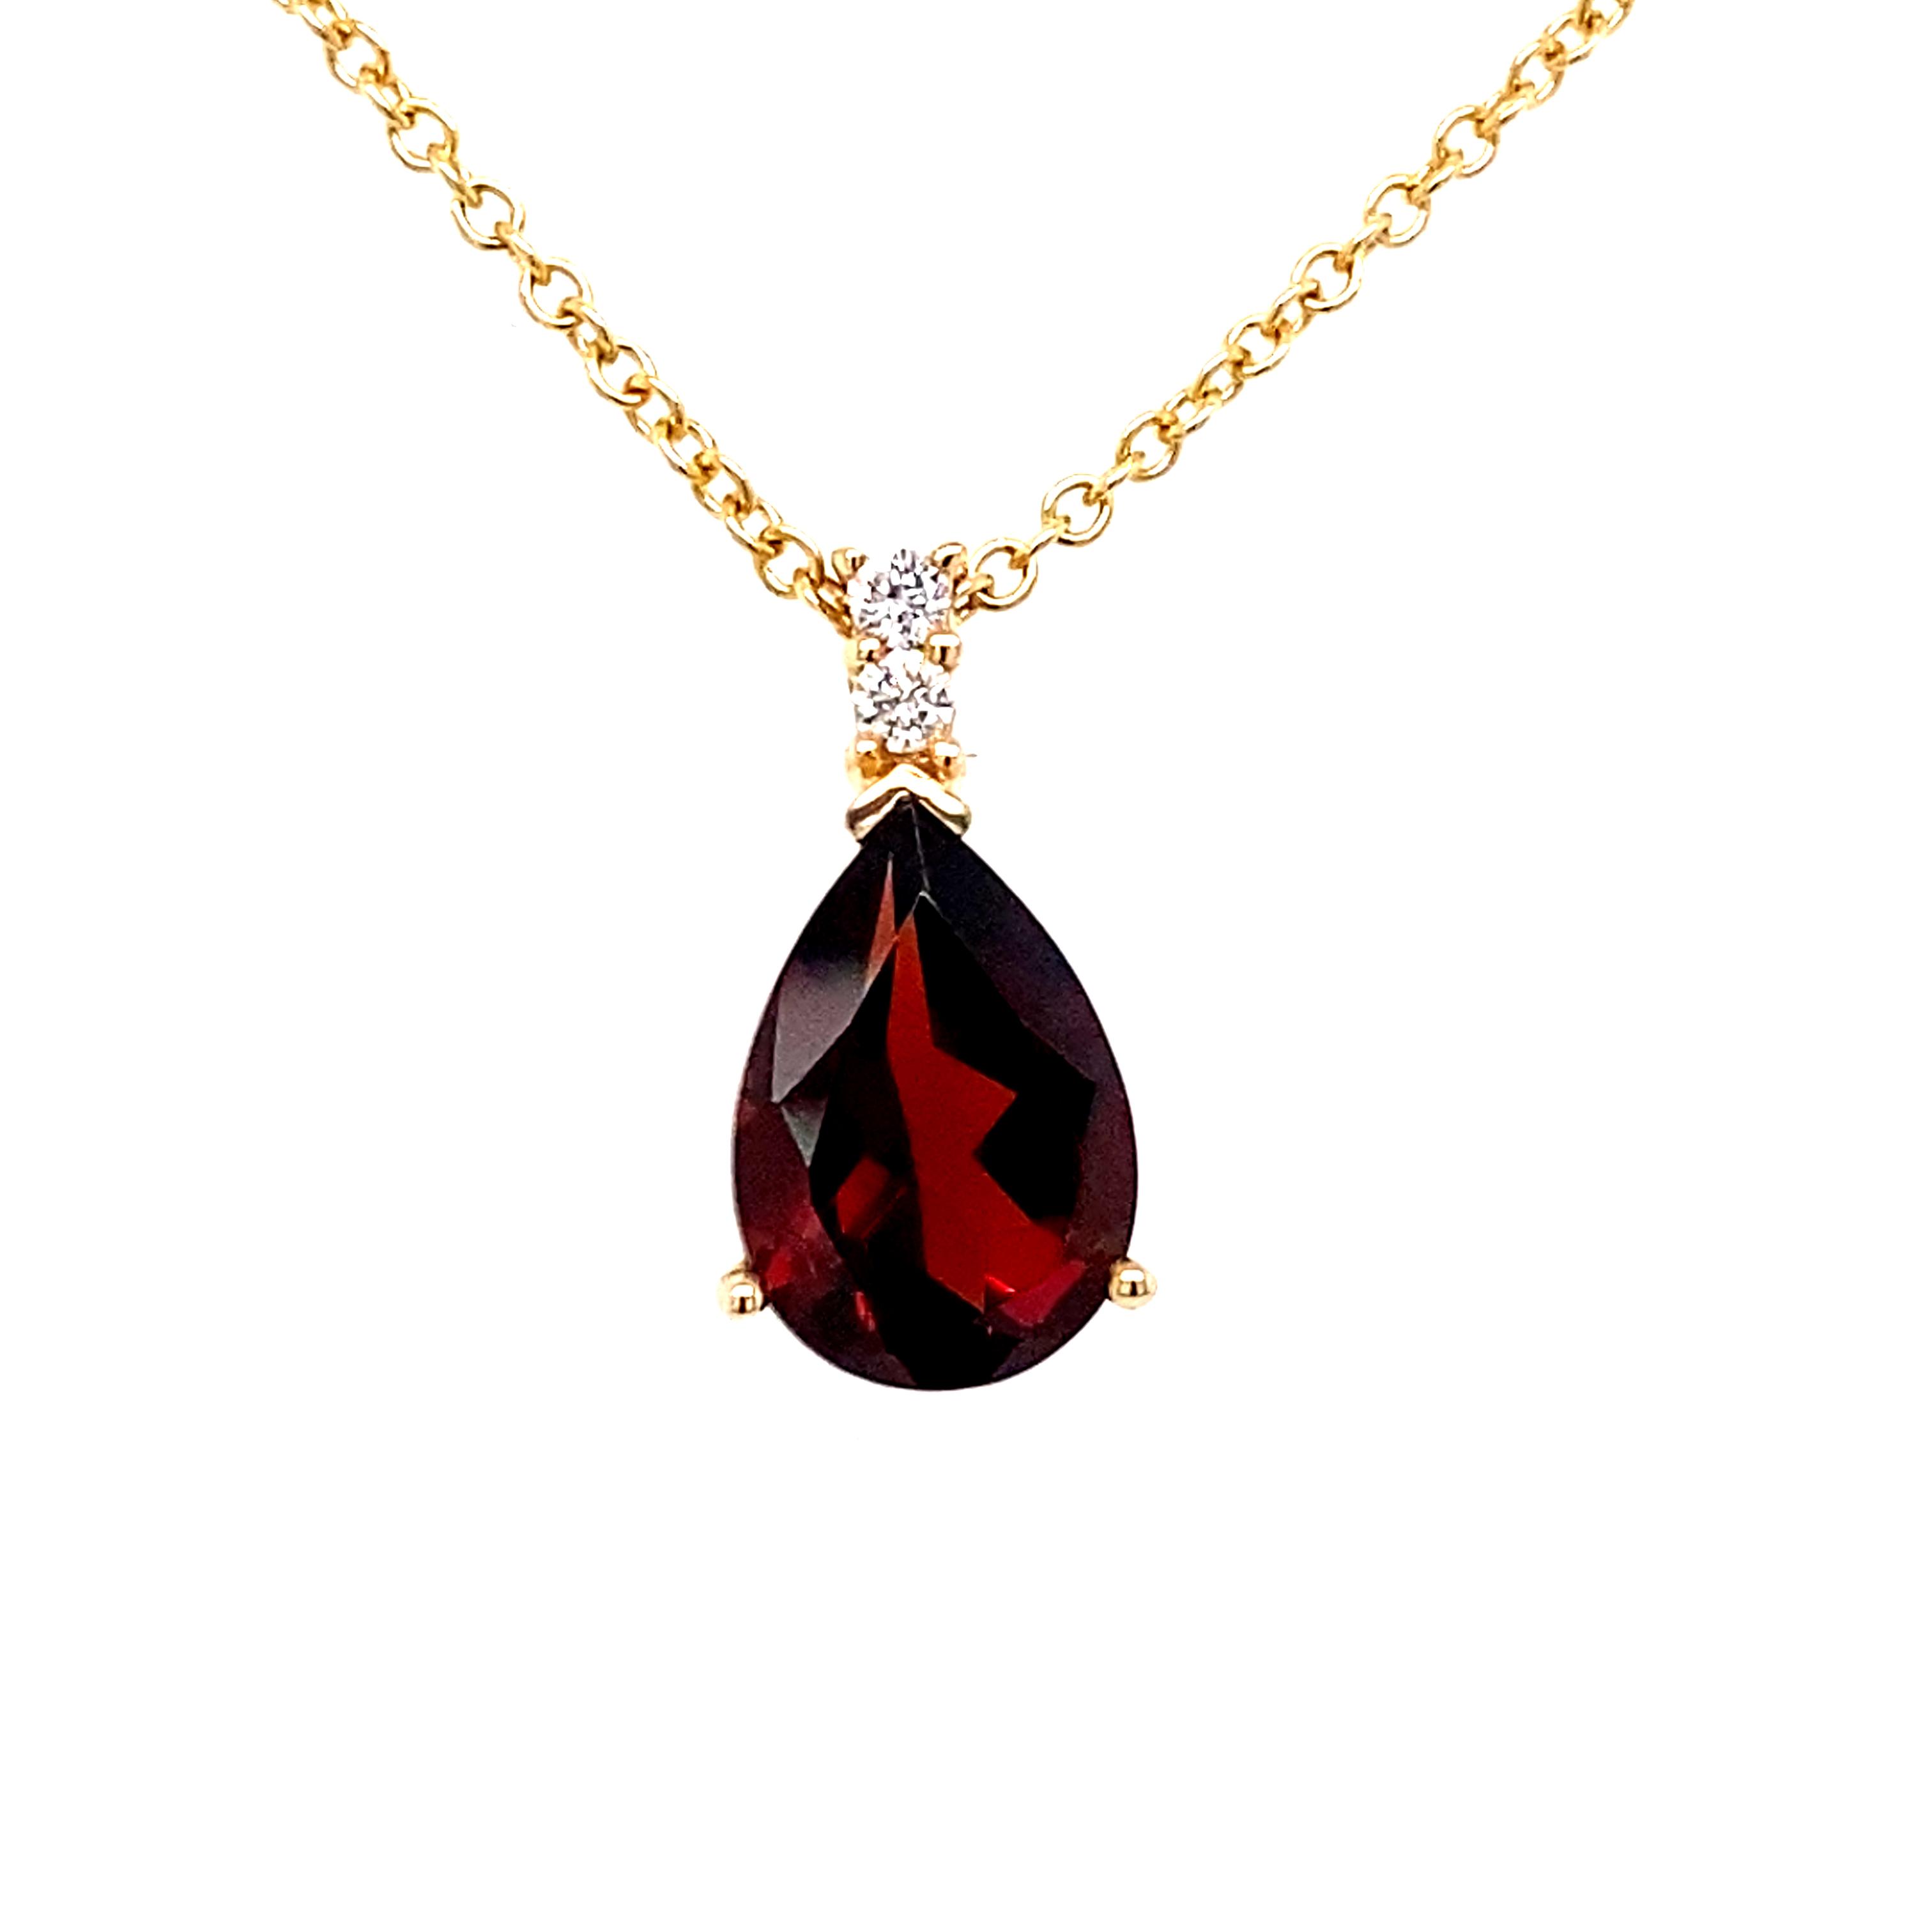 18 Carat Yellow Gold, Garnet and diamond pendant